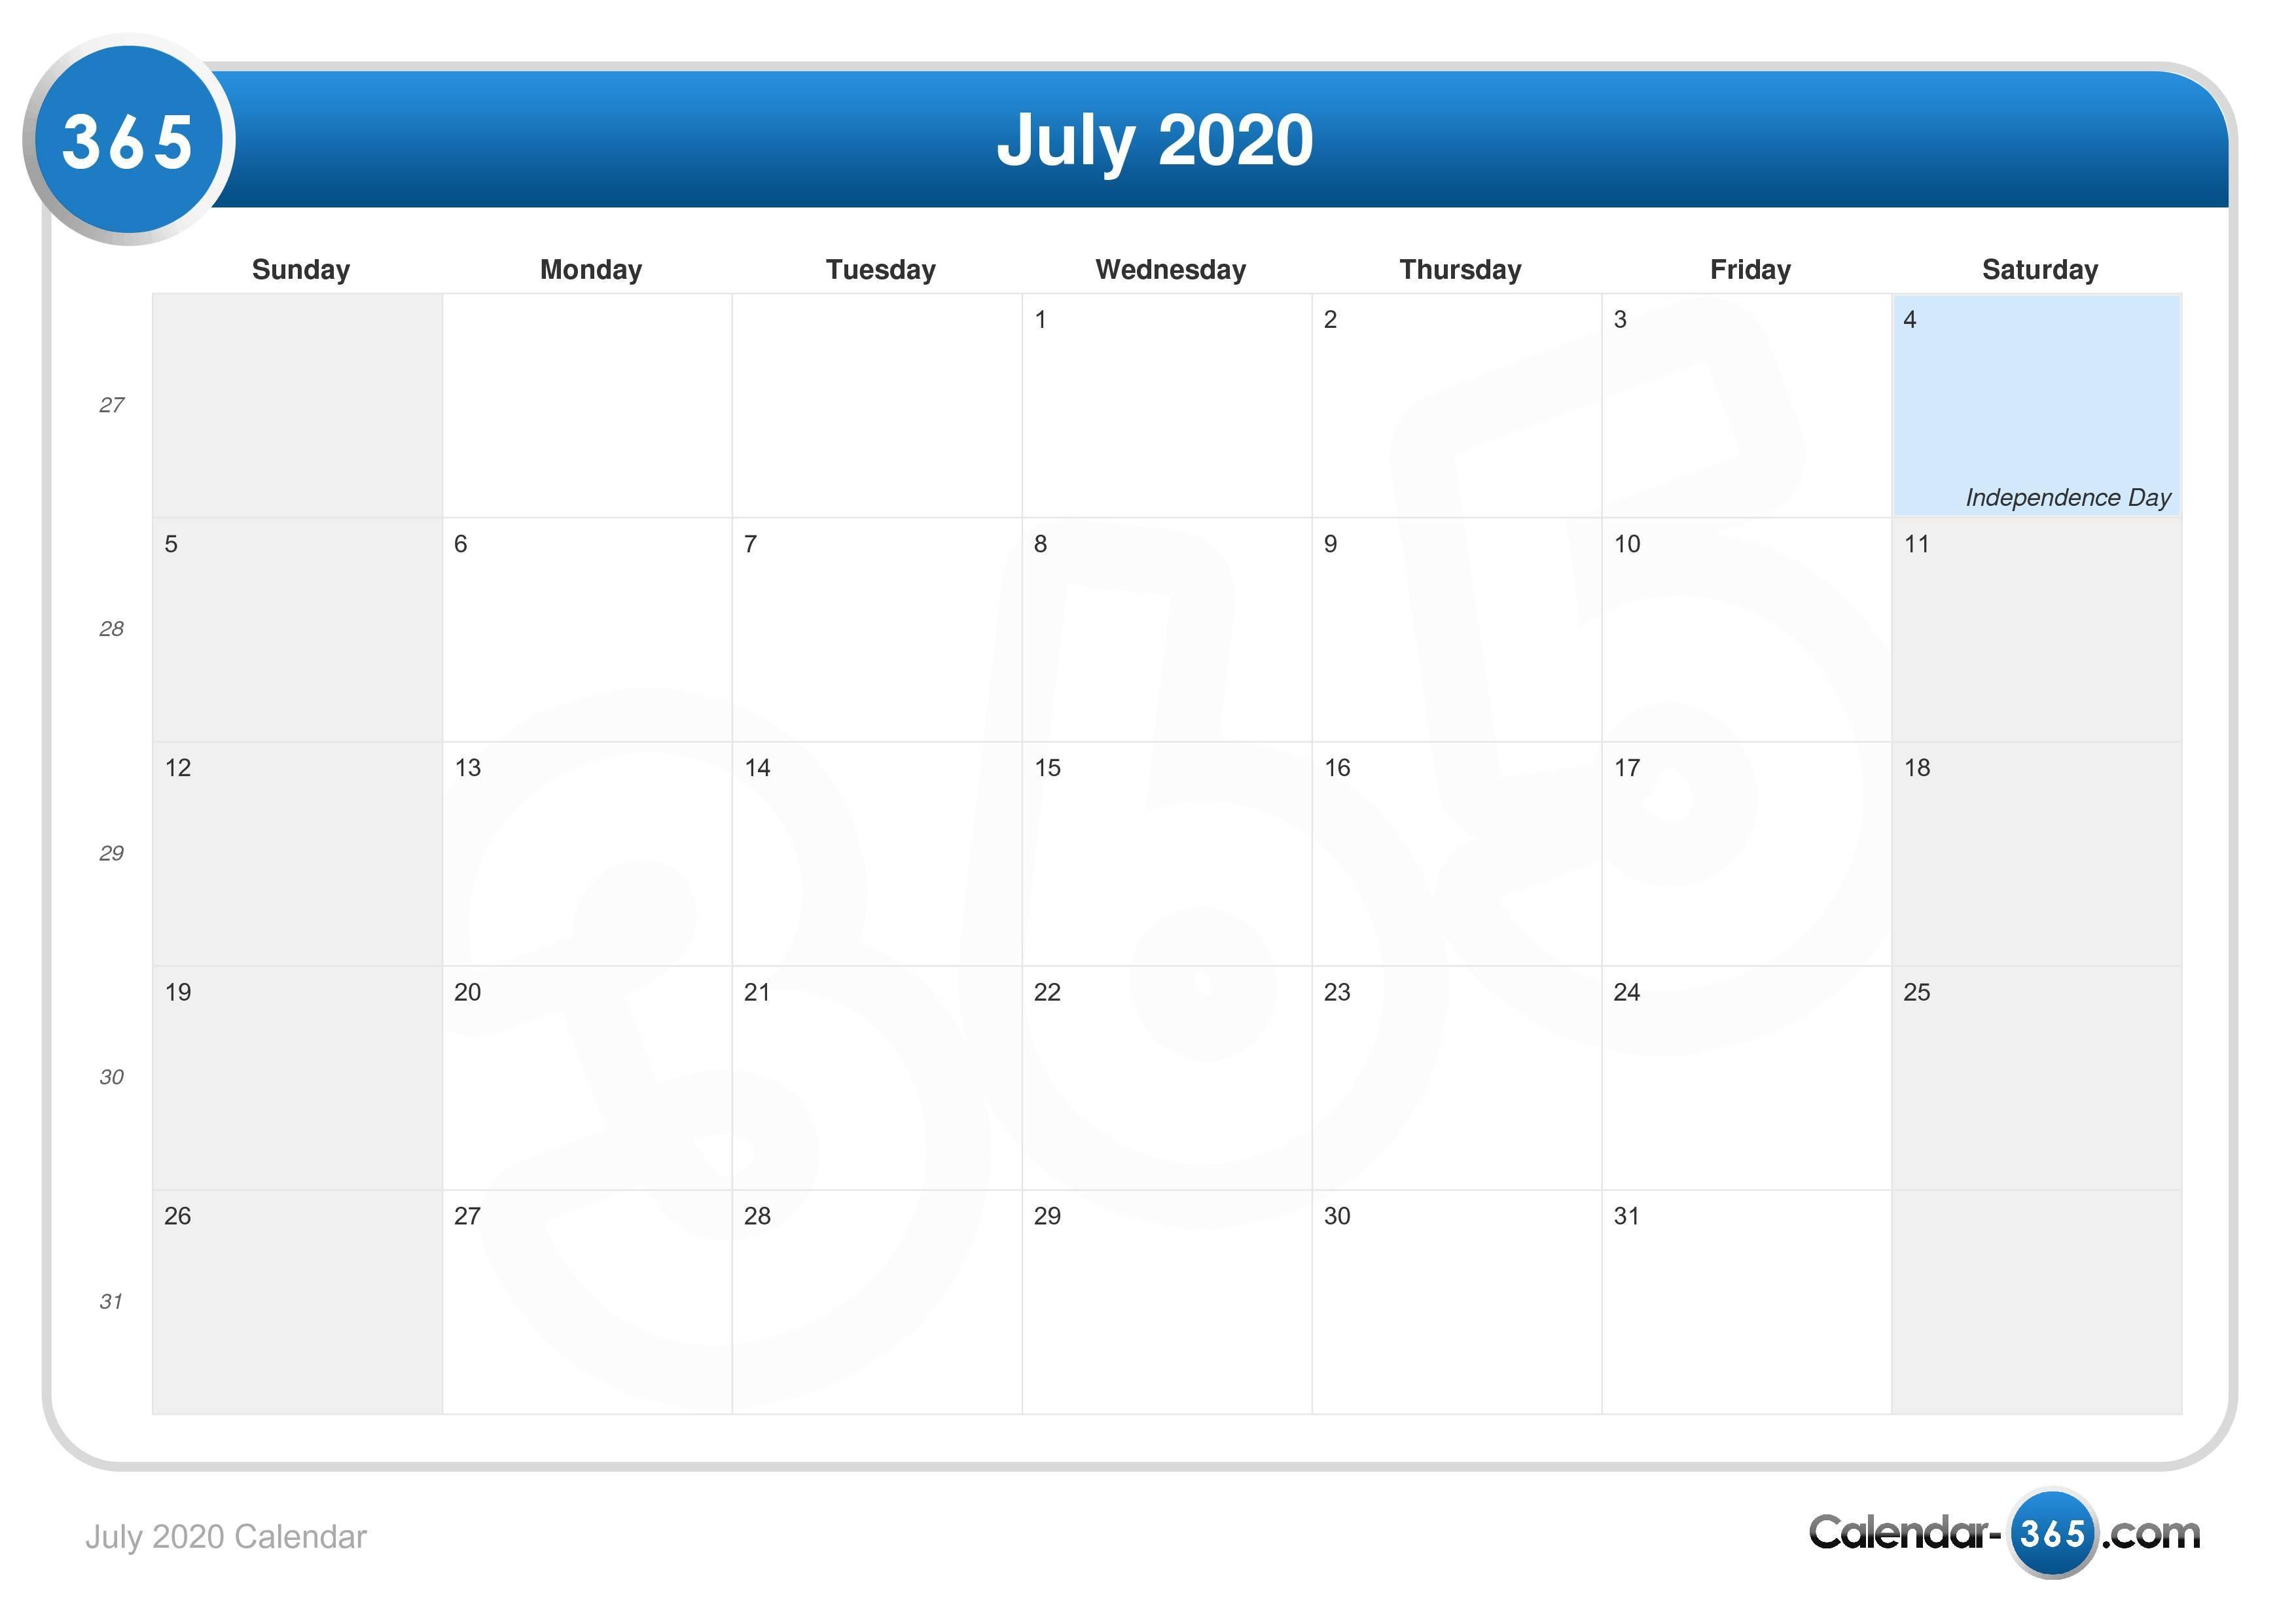 July 2020 Calendar